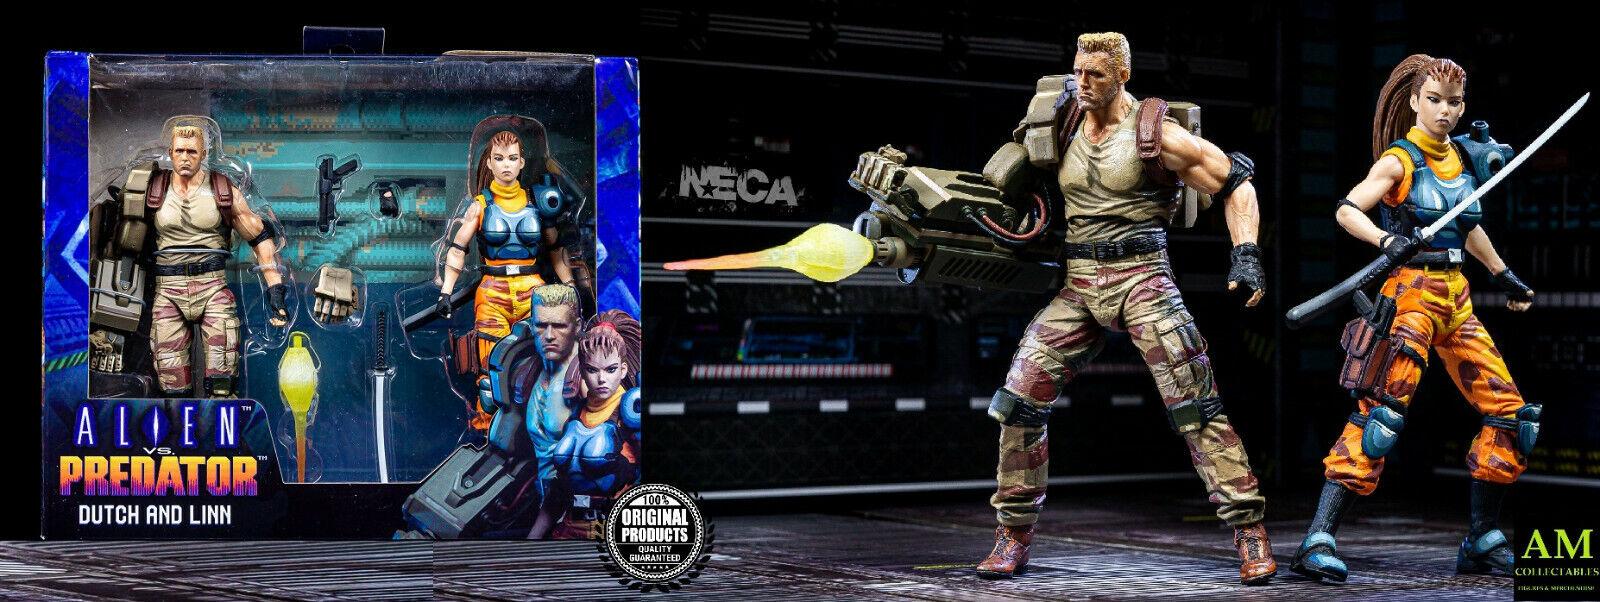 Neca-alien vs predator 1994 arcade appearance-Dutch and linn - 2 pack